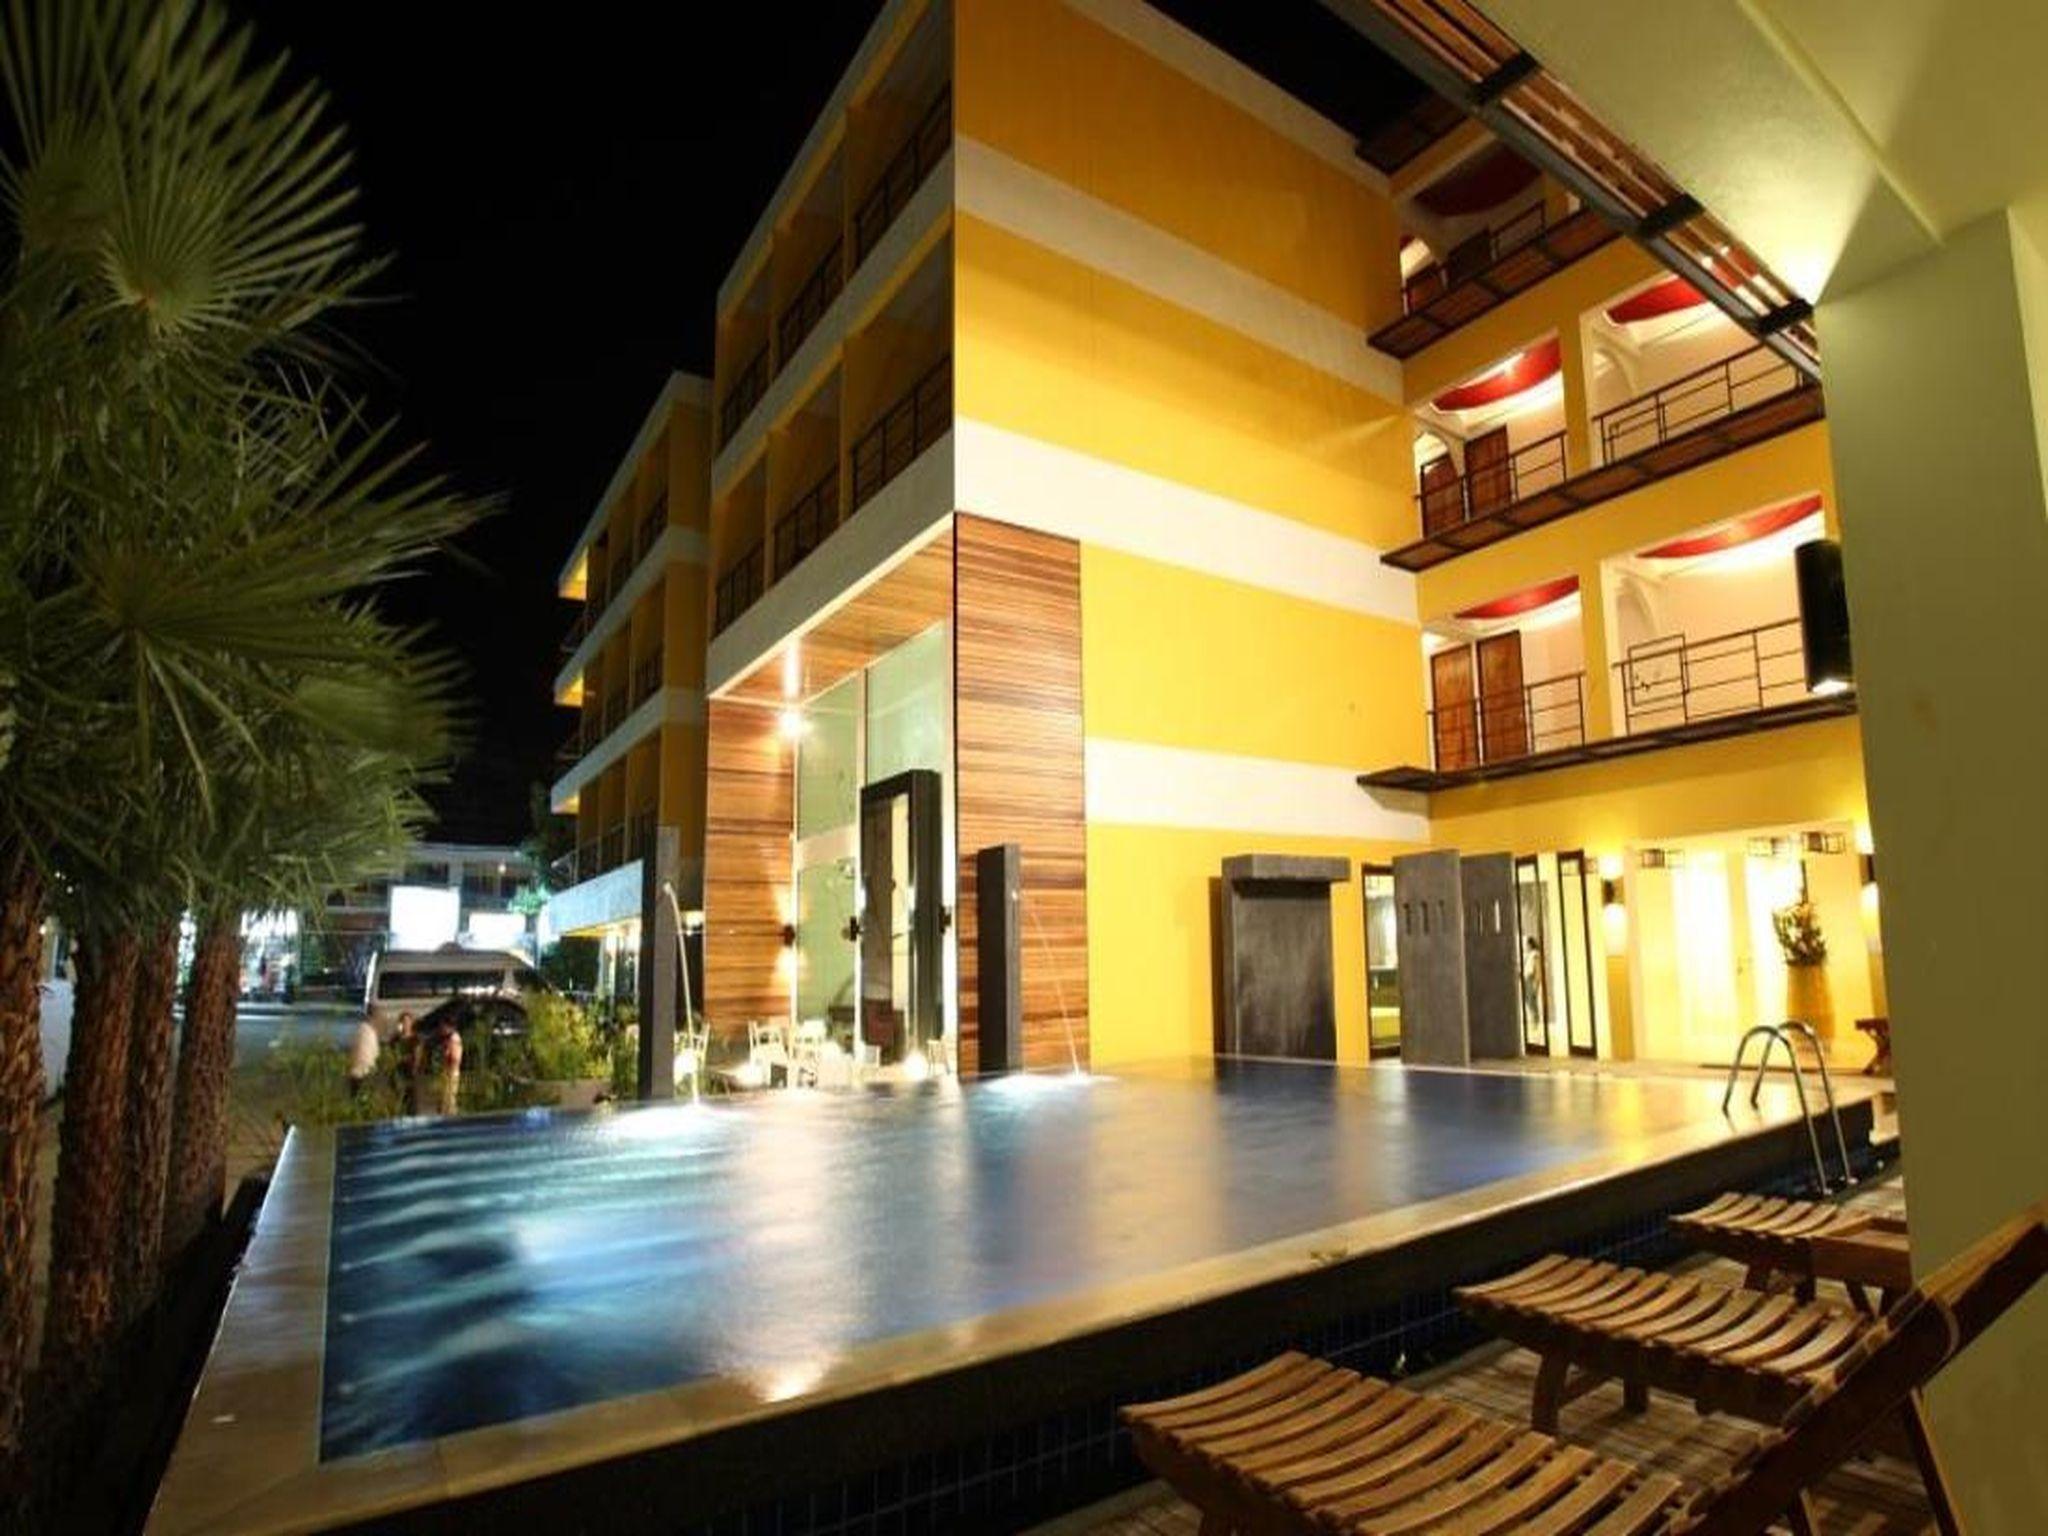 Keeree Ele Hotel โรงแรมคีรีเอเล